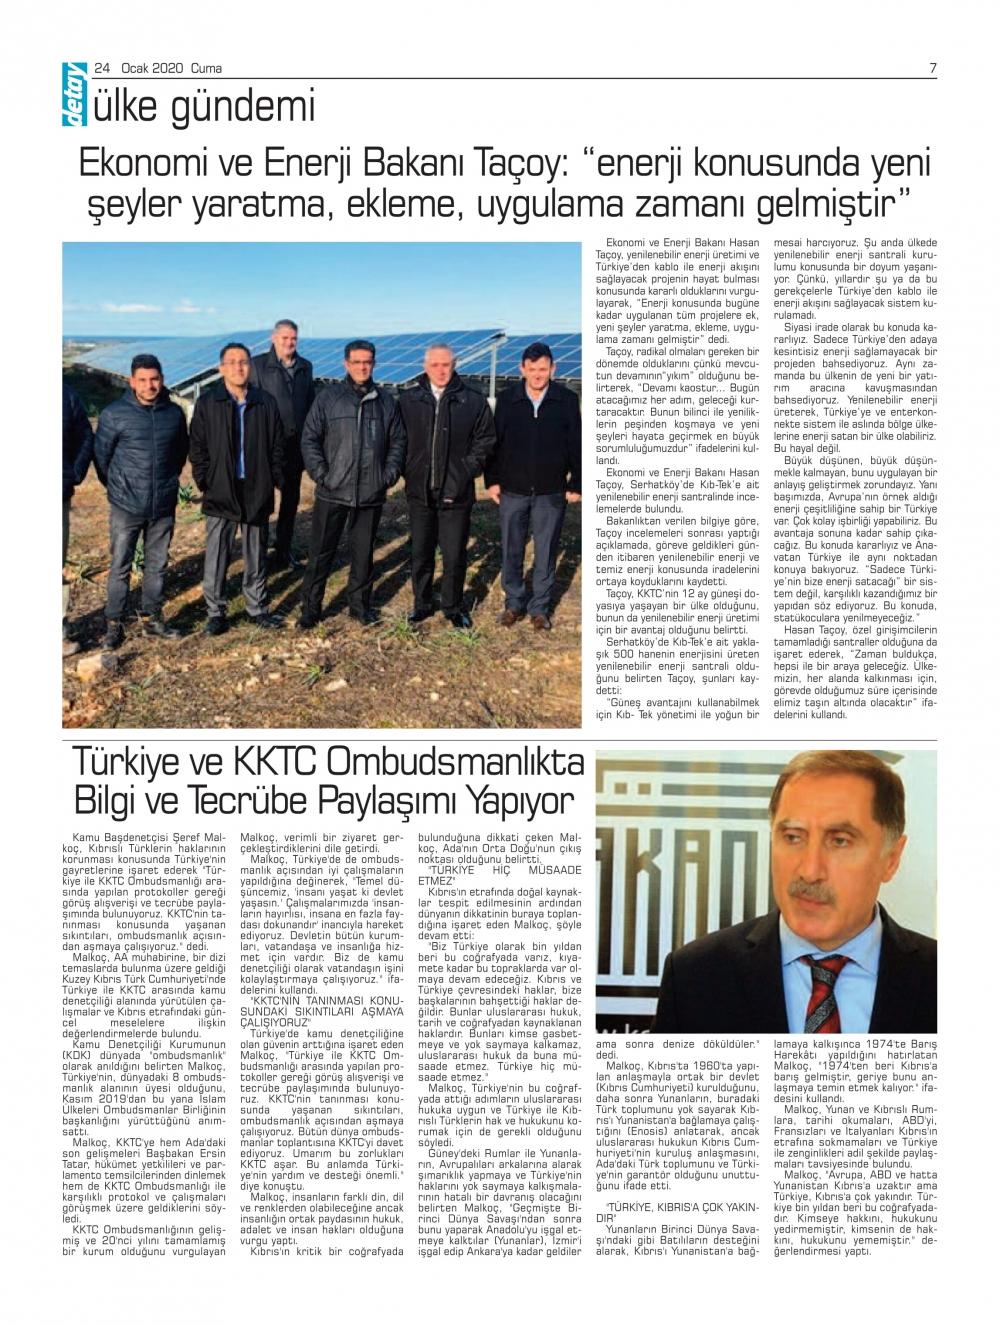 Detay Gazetes 24 Ocak 2020 galerisi resim 8